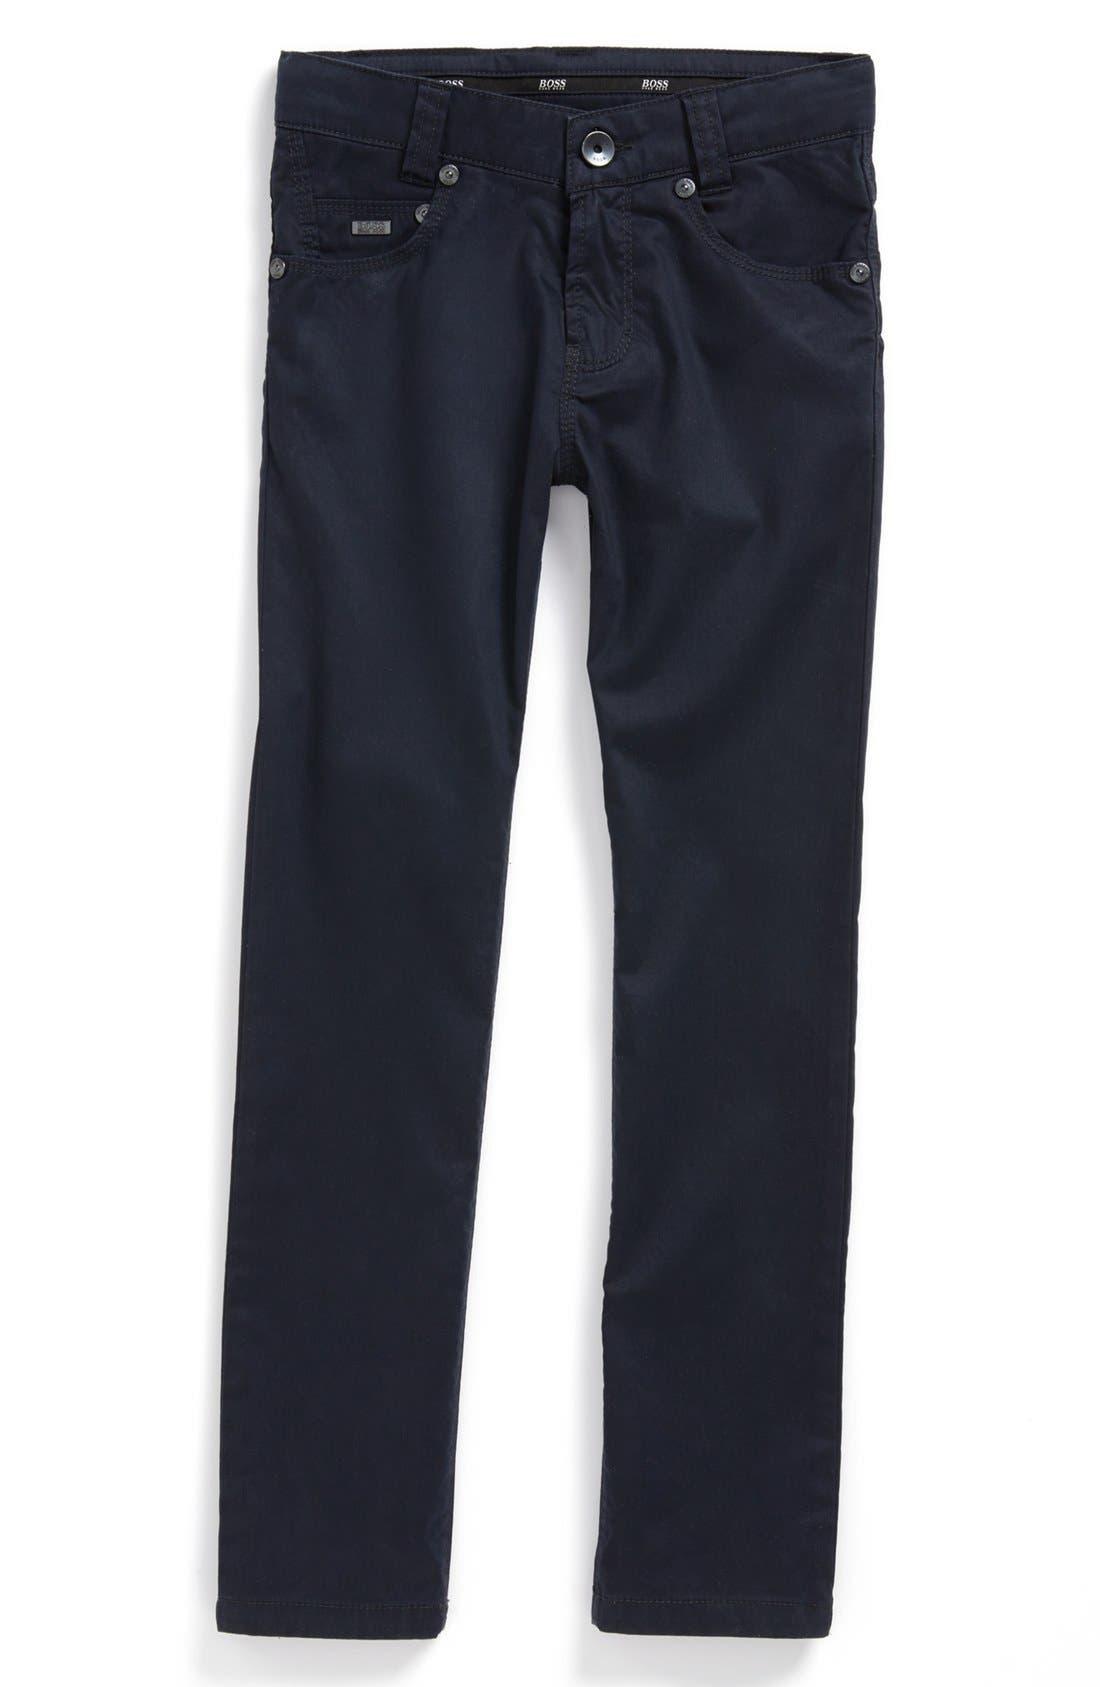 Main Image - BOSS Kidswear Stretch Twill Jeans (Little Boys & Big Boys)